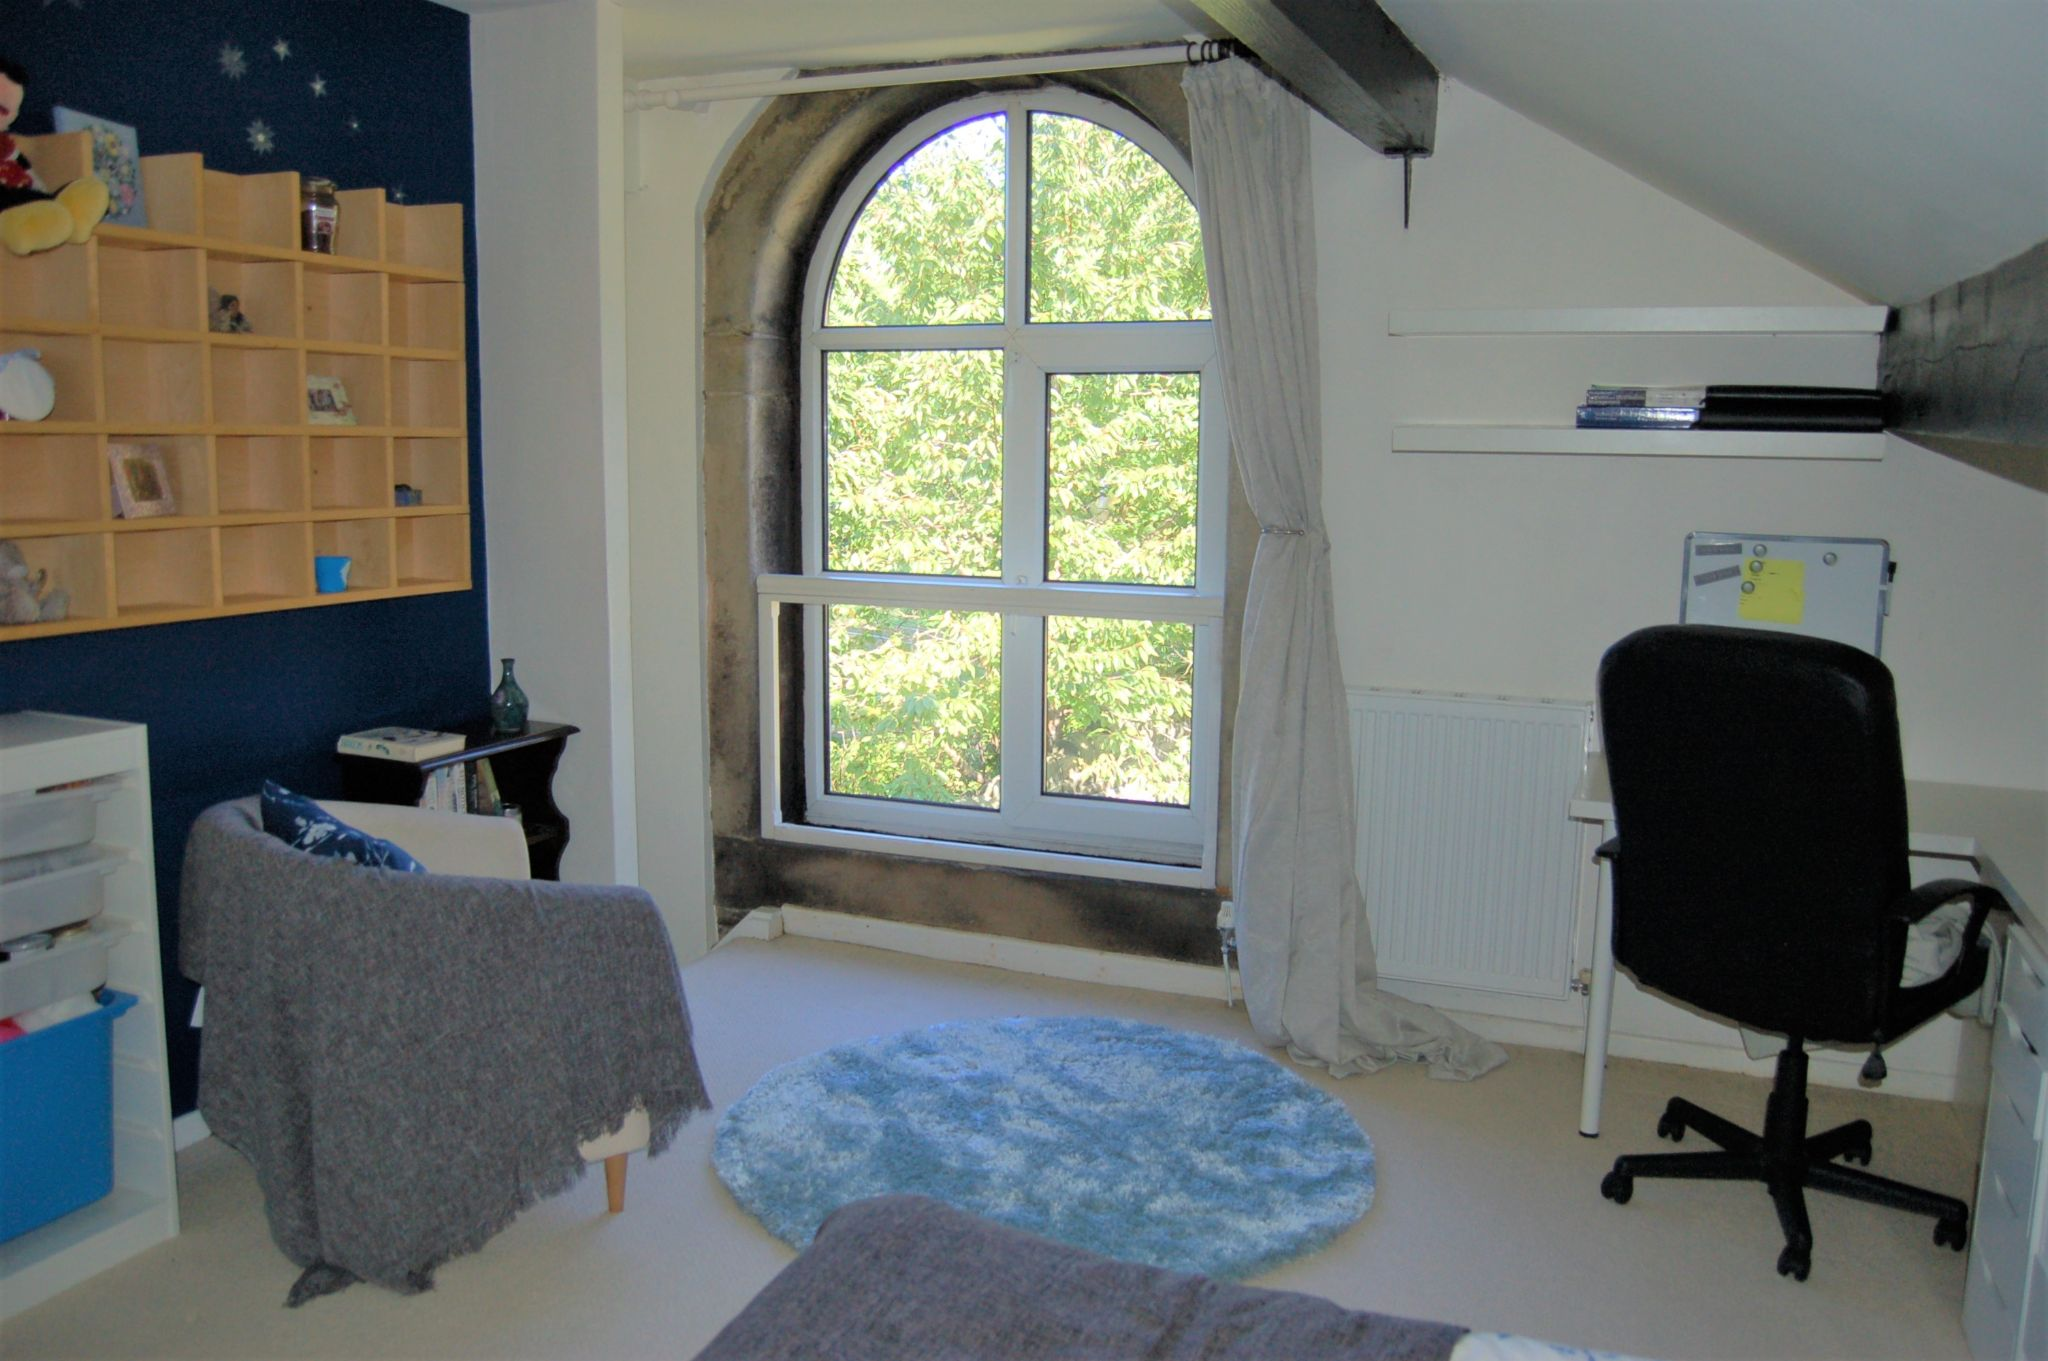 5 bedroom barn conversion house SSTC in Hebden Bridge - Photograph 11